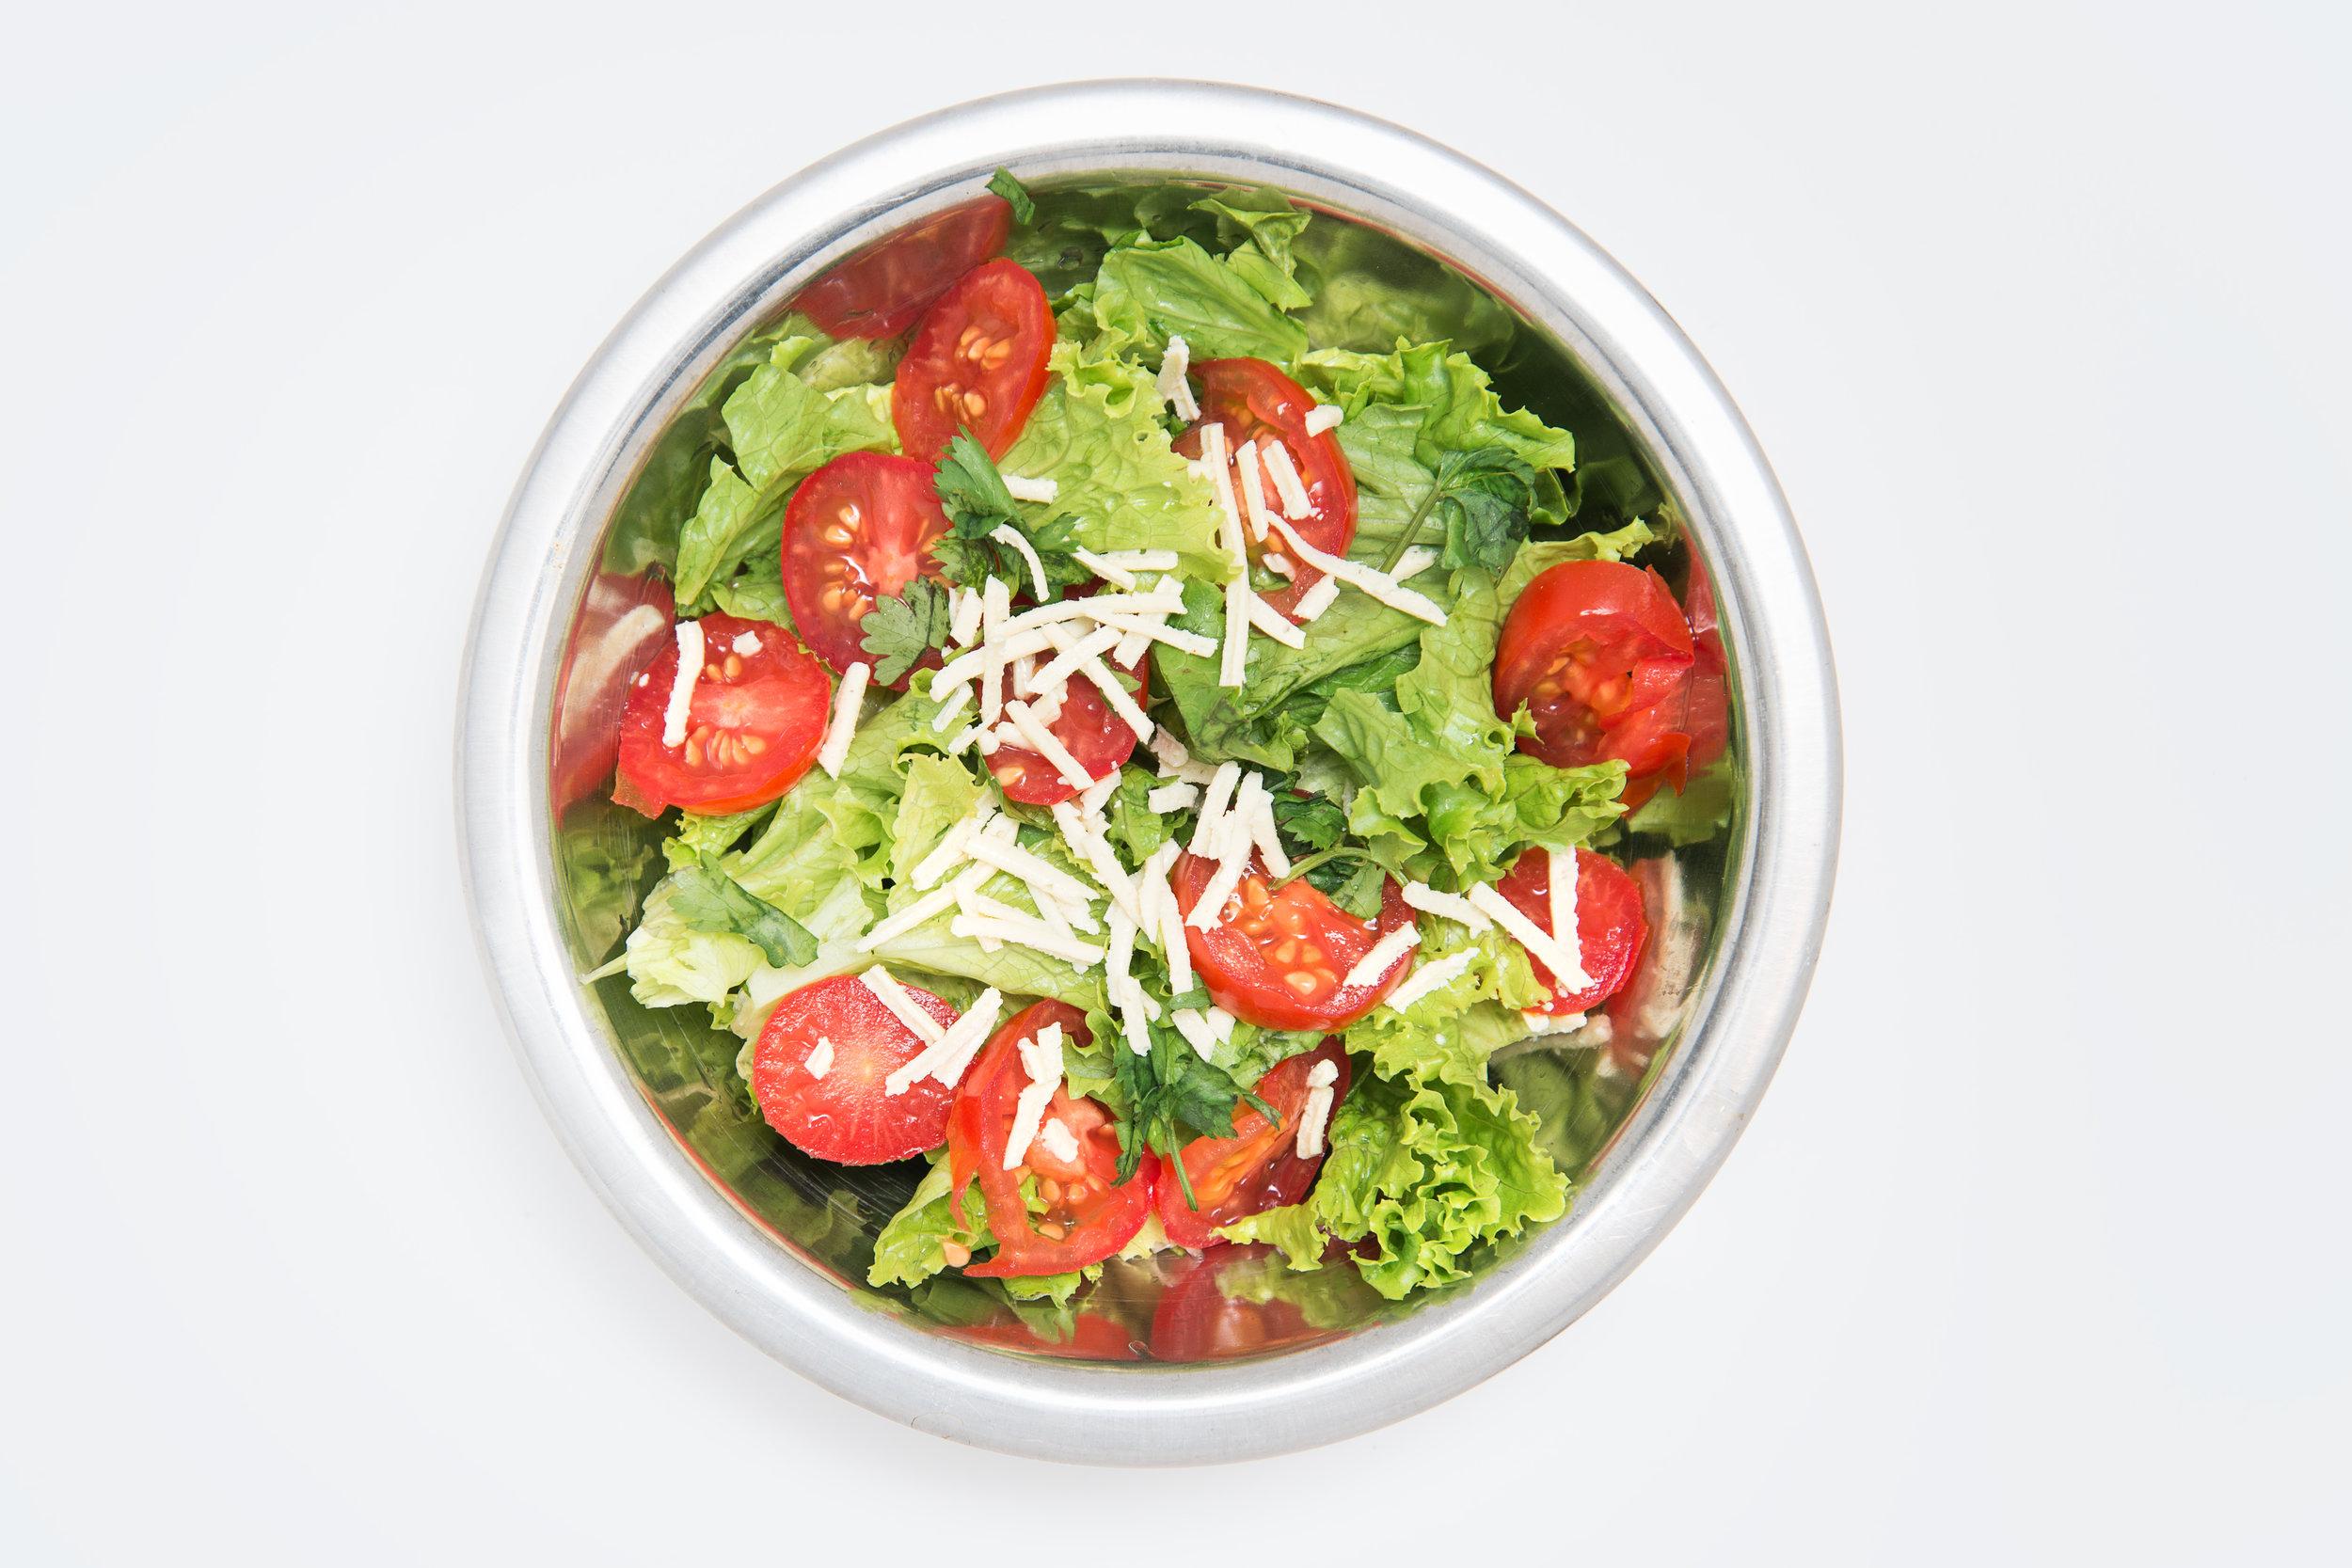 Simple Salad, Lettuce, Tomatoes, Vegan Mozzarella Shreds